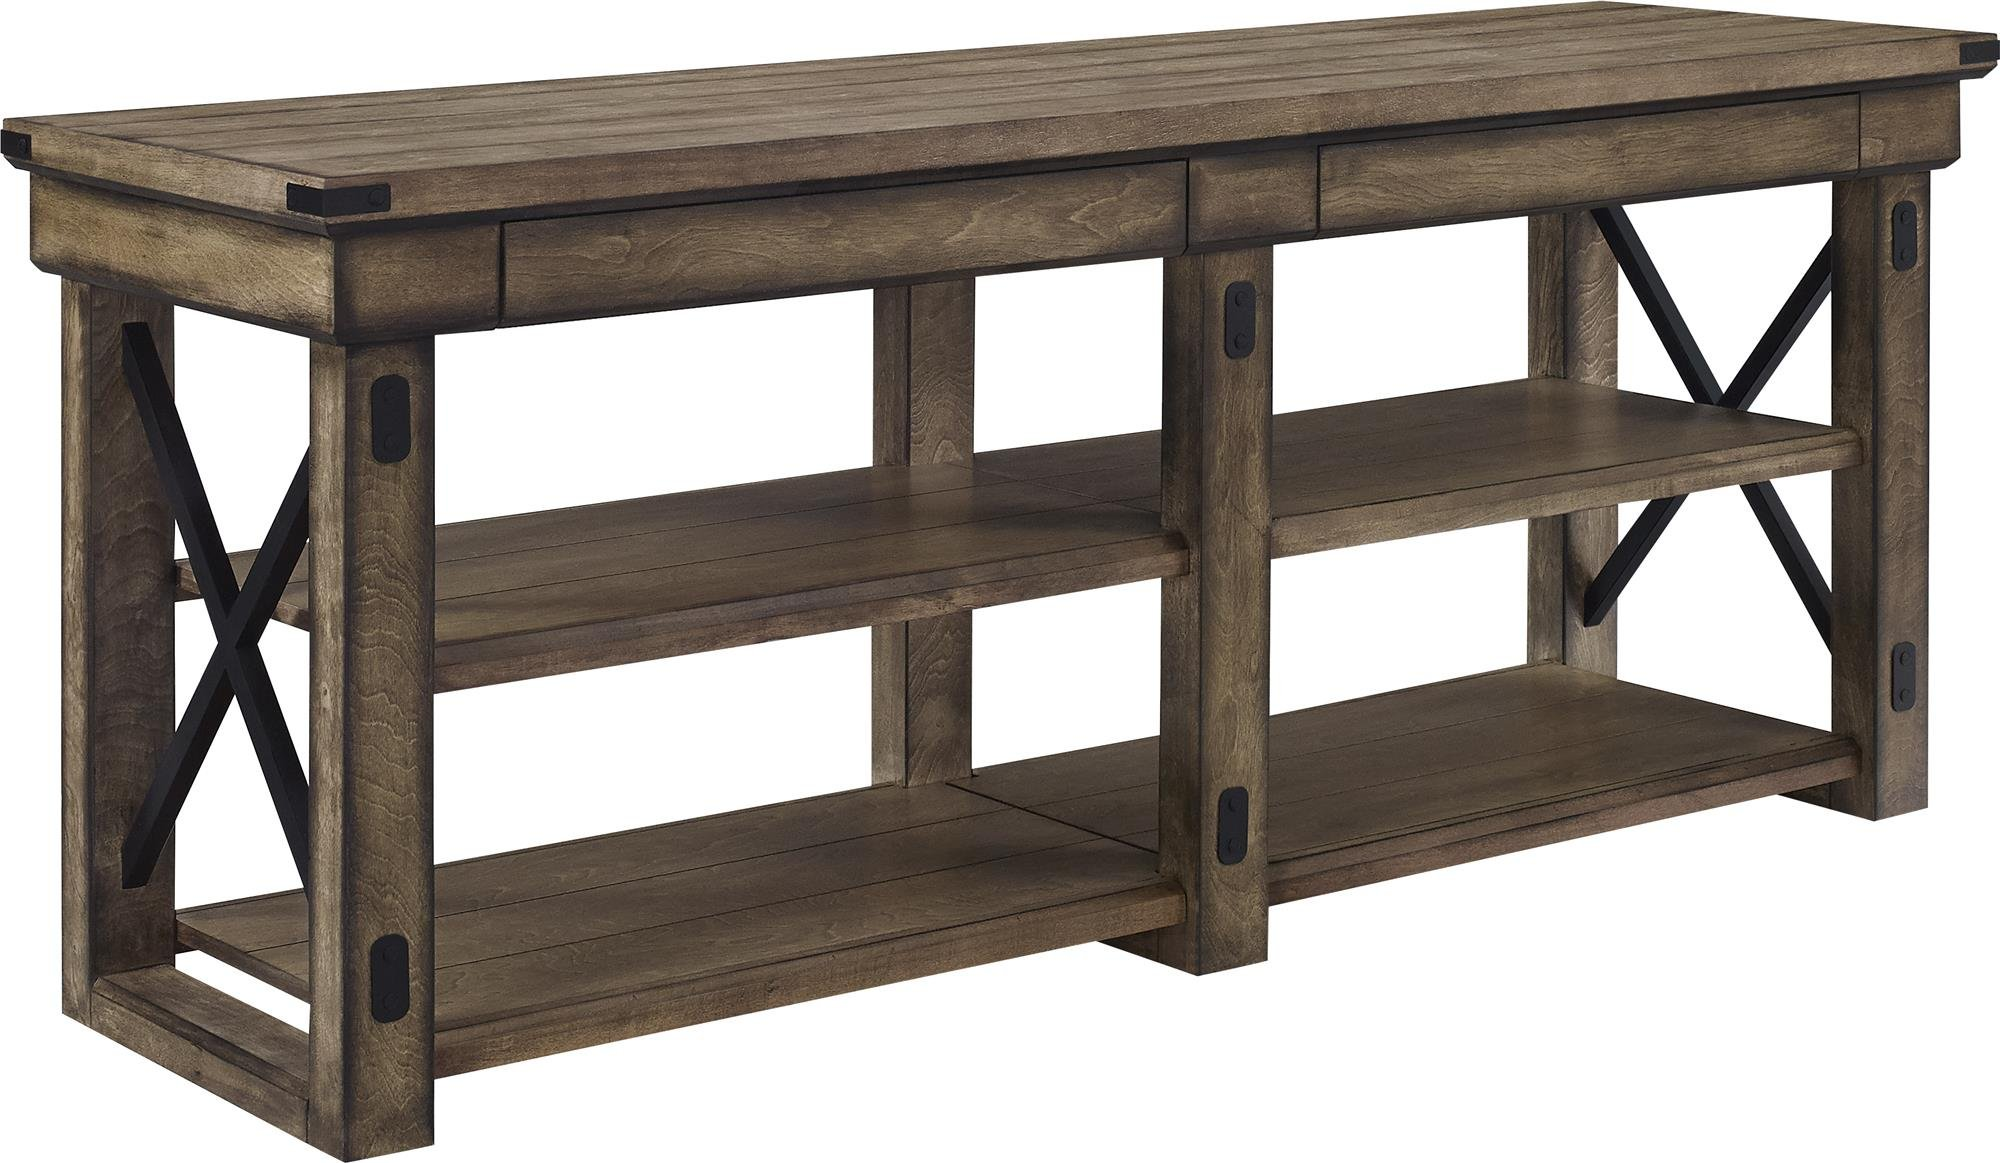 Stupendous Galleon Altra Furniture Ameriwood Home Wildwood Wood Inzonedesignstudio Interior Chair Design Inzonedesignstudiocom